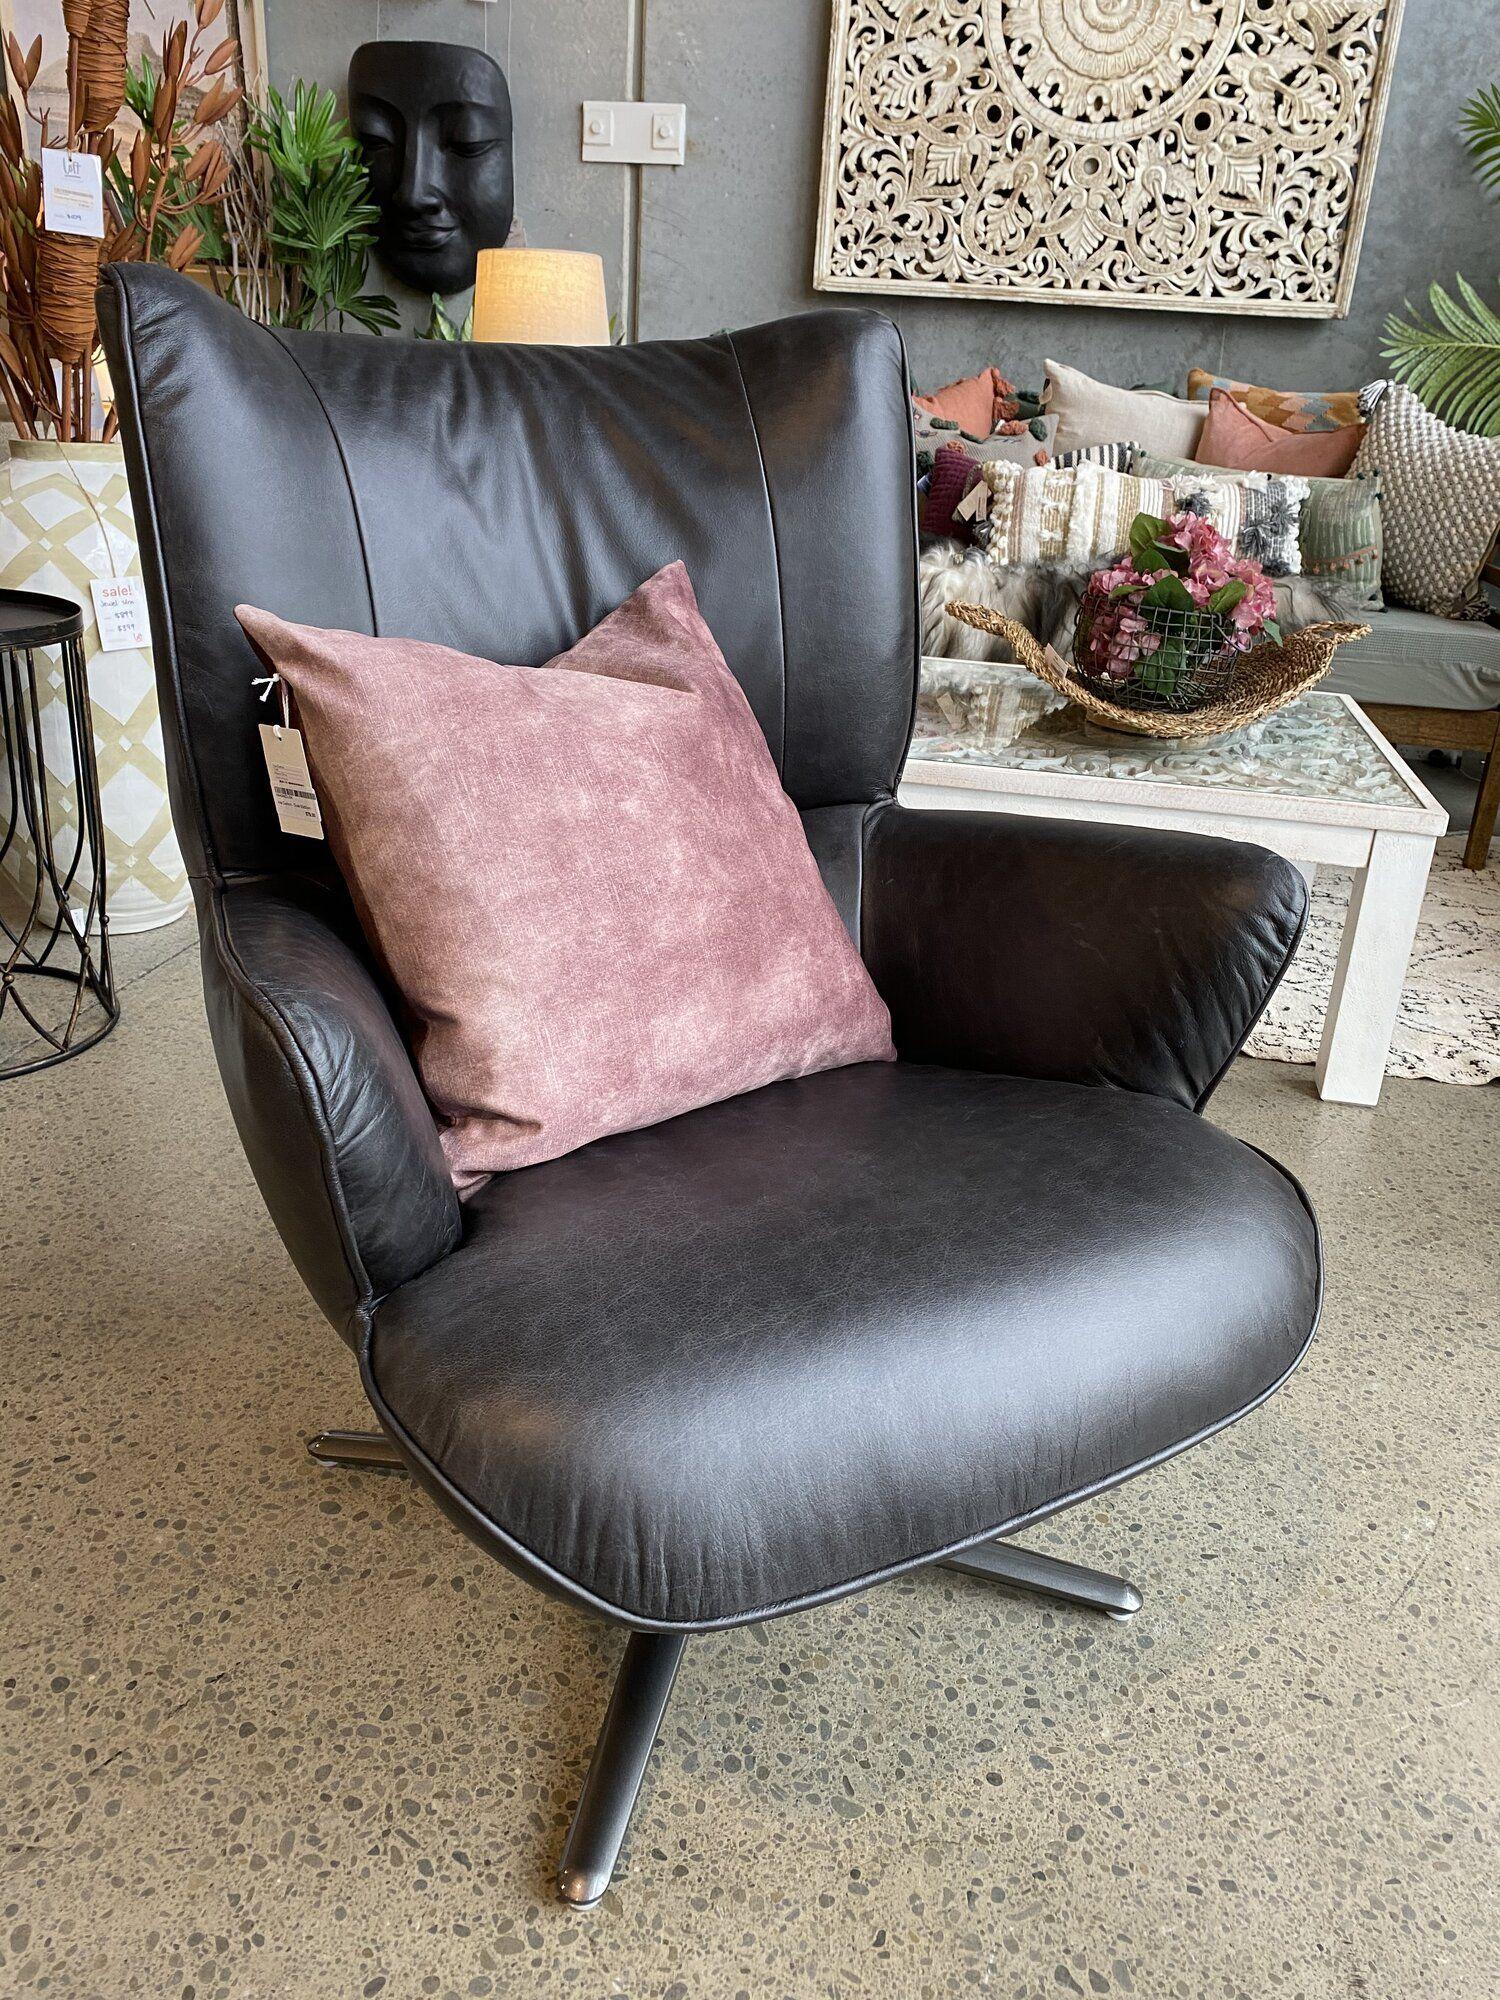 Pablo Swivel Chair Leather Loft Furniture New Zealand In 2020 Leather Loft Chair Swivel Chair